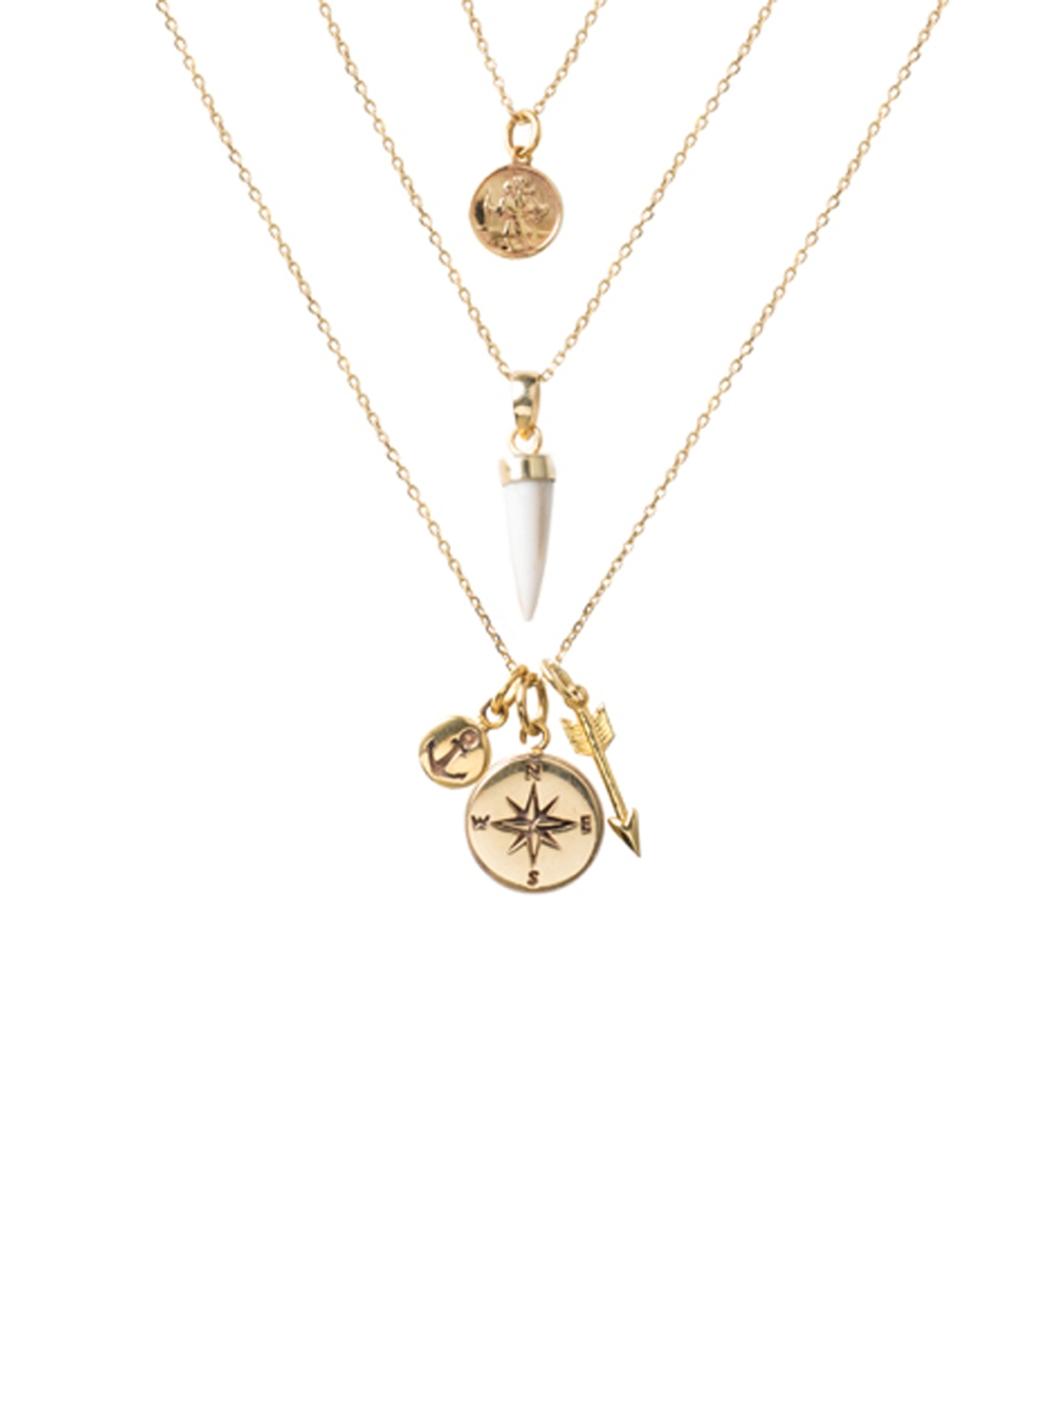 tsj0552-trio-of-layered-necklaces